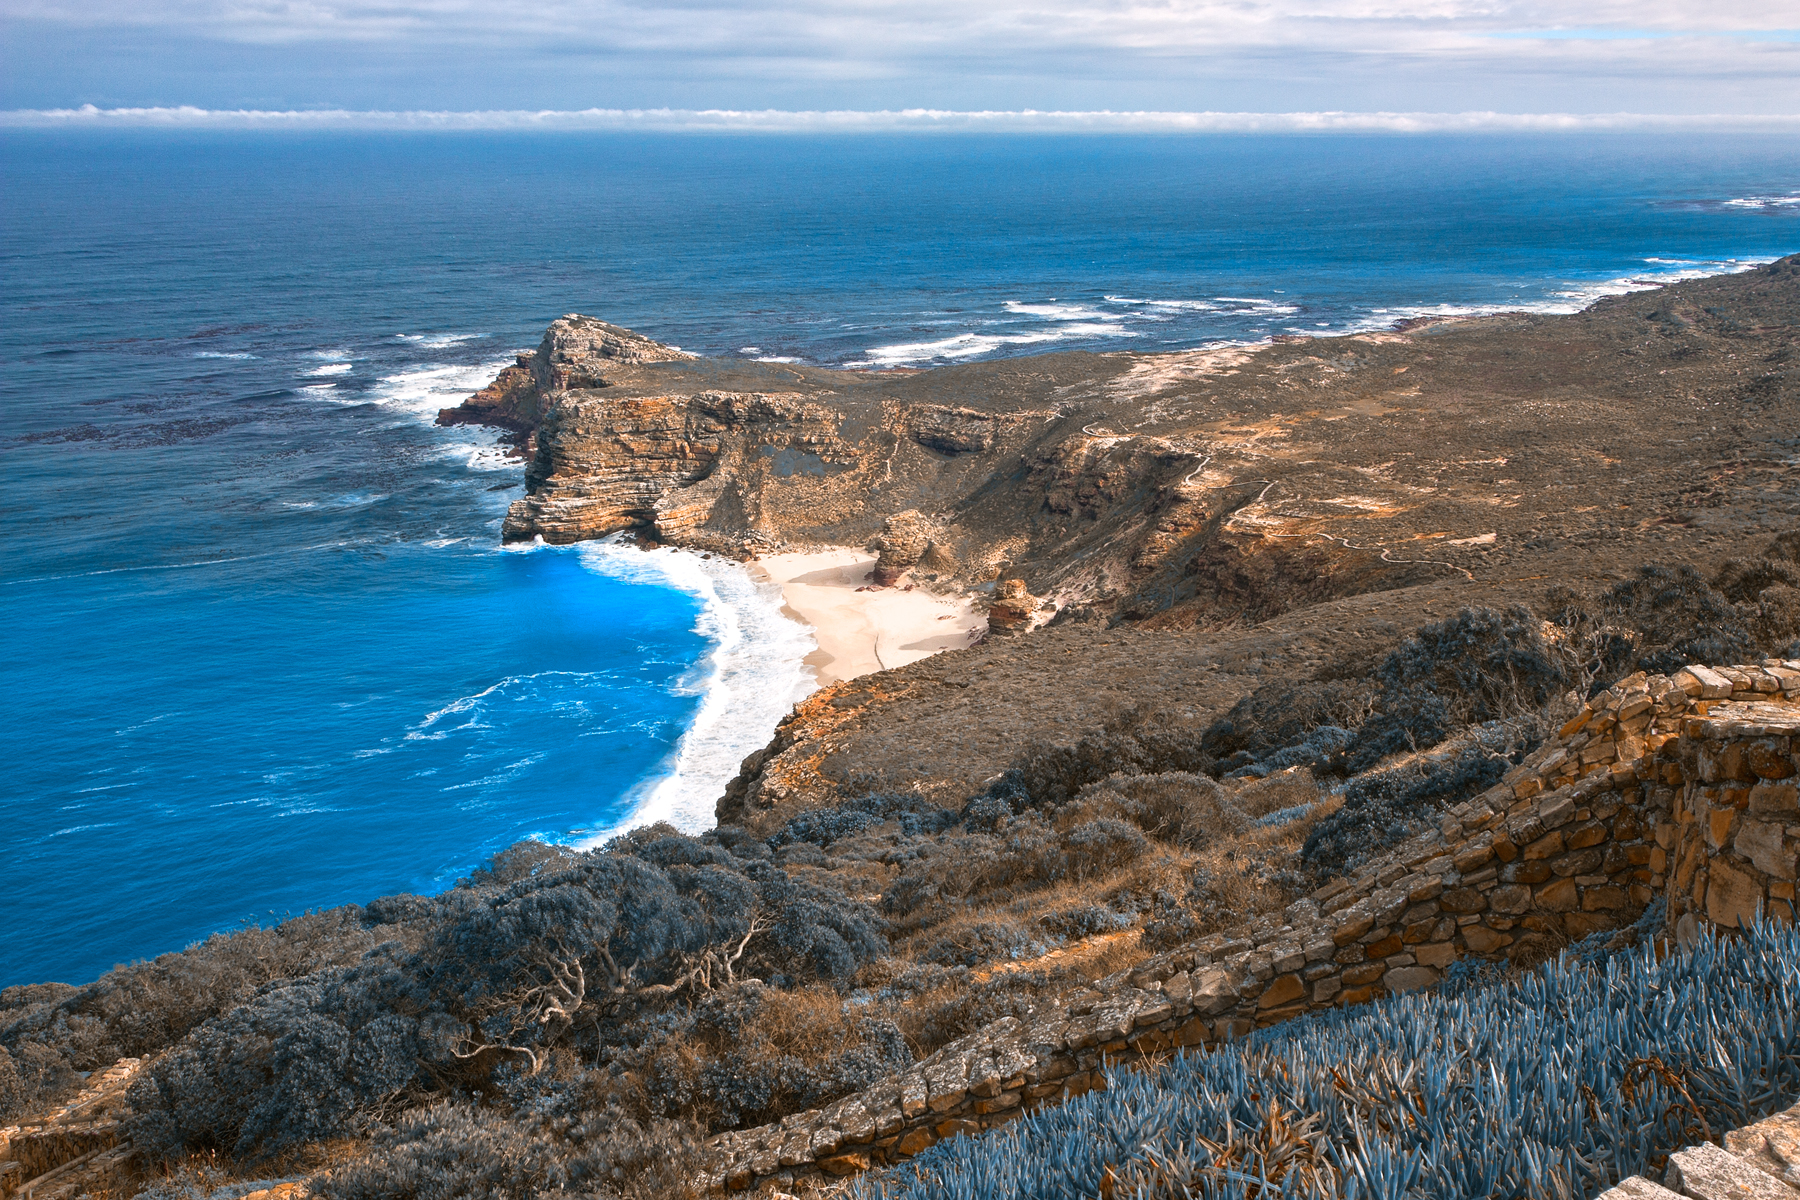 Cape blue point - hdr photo